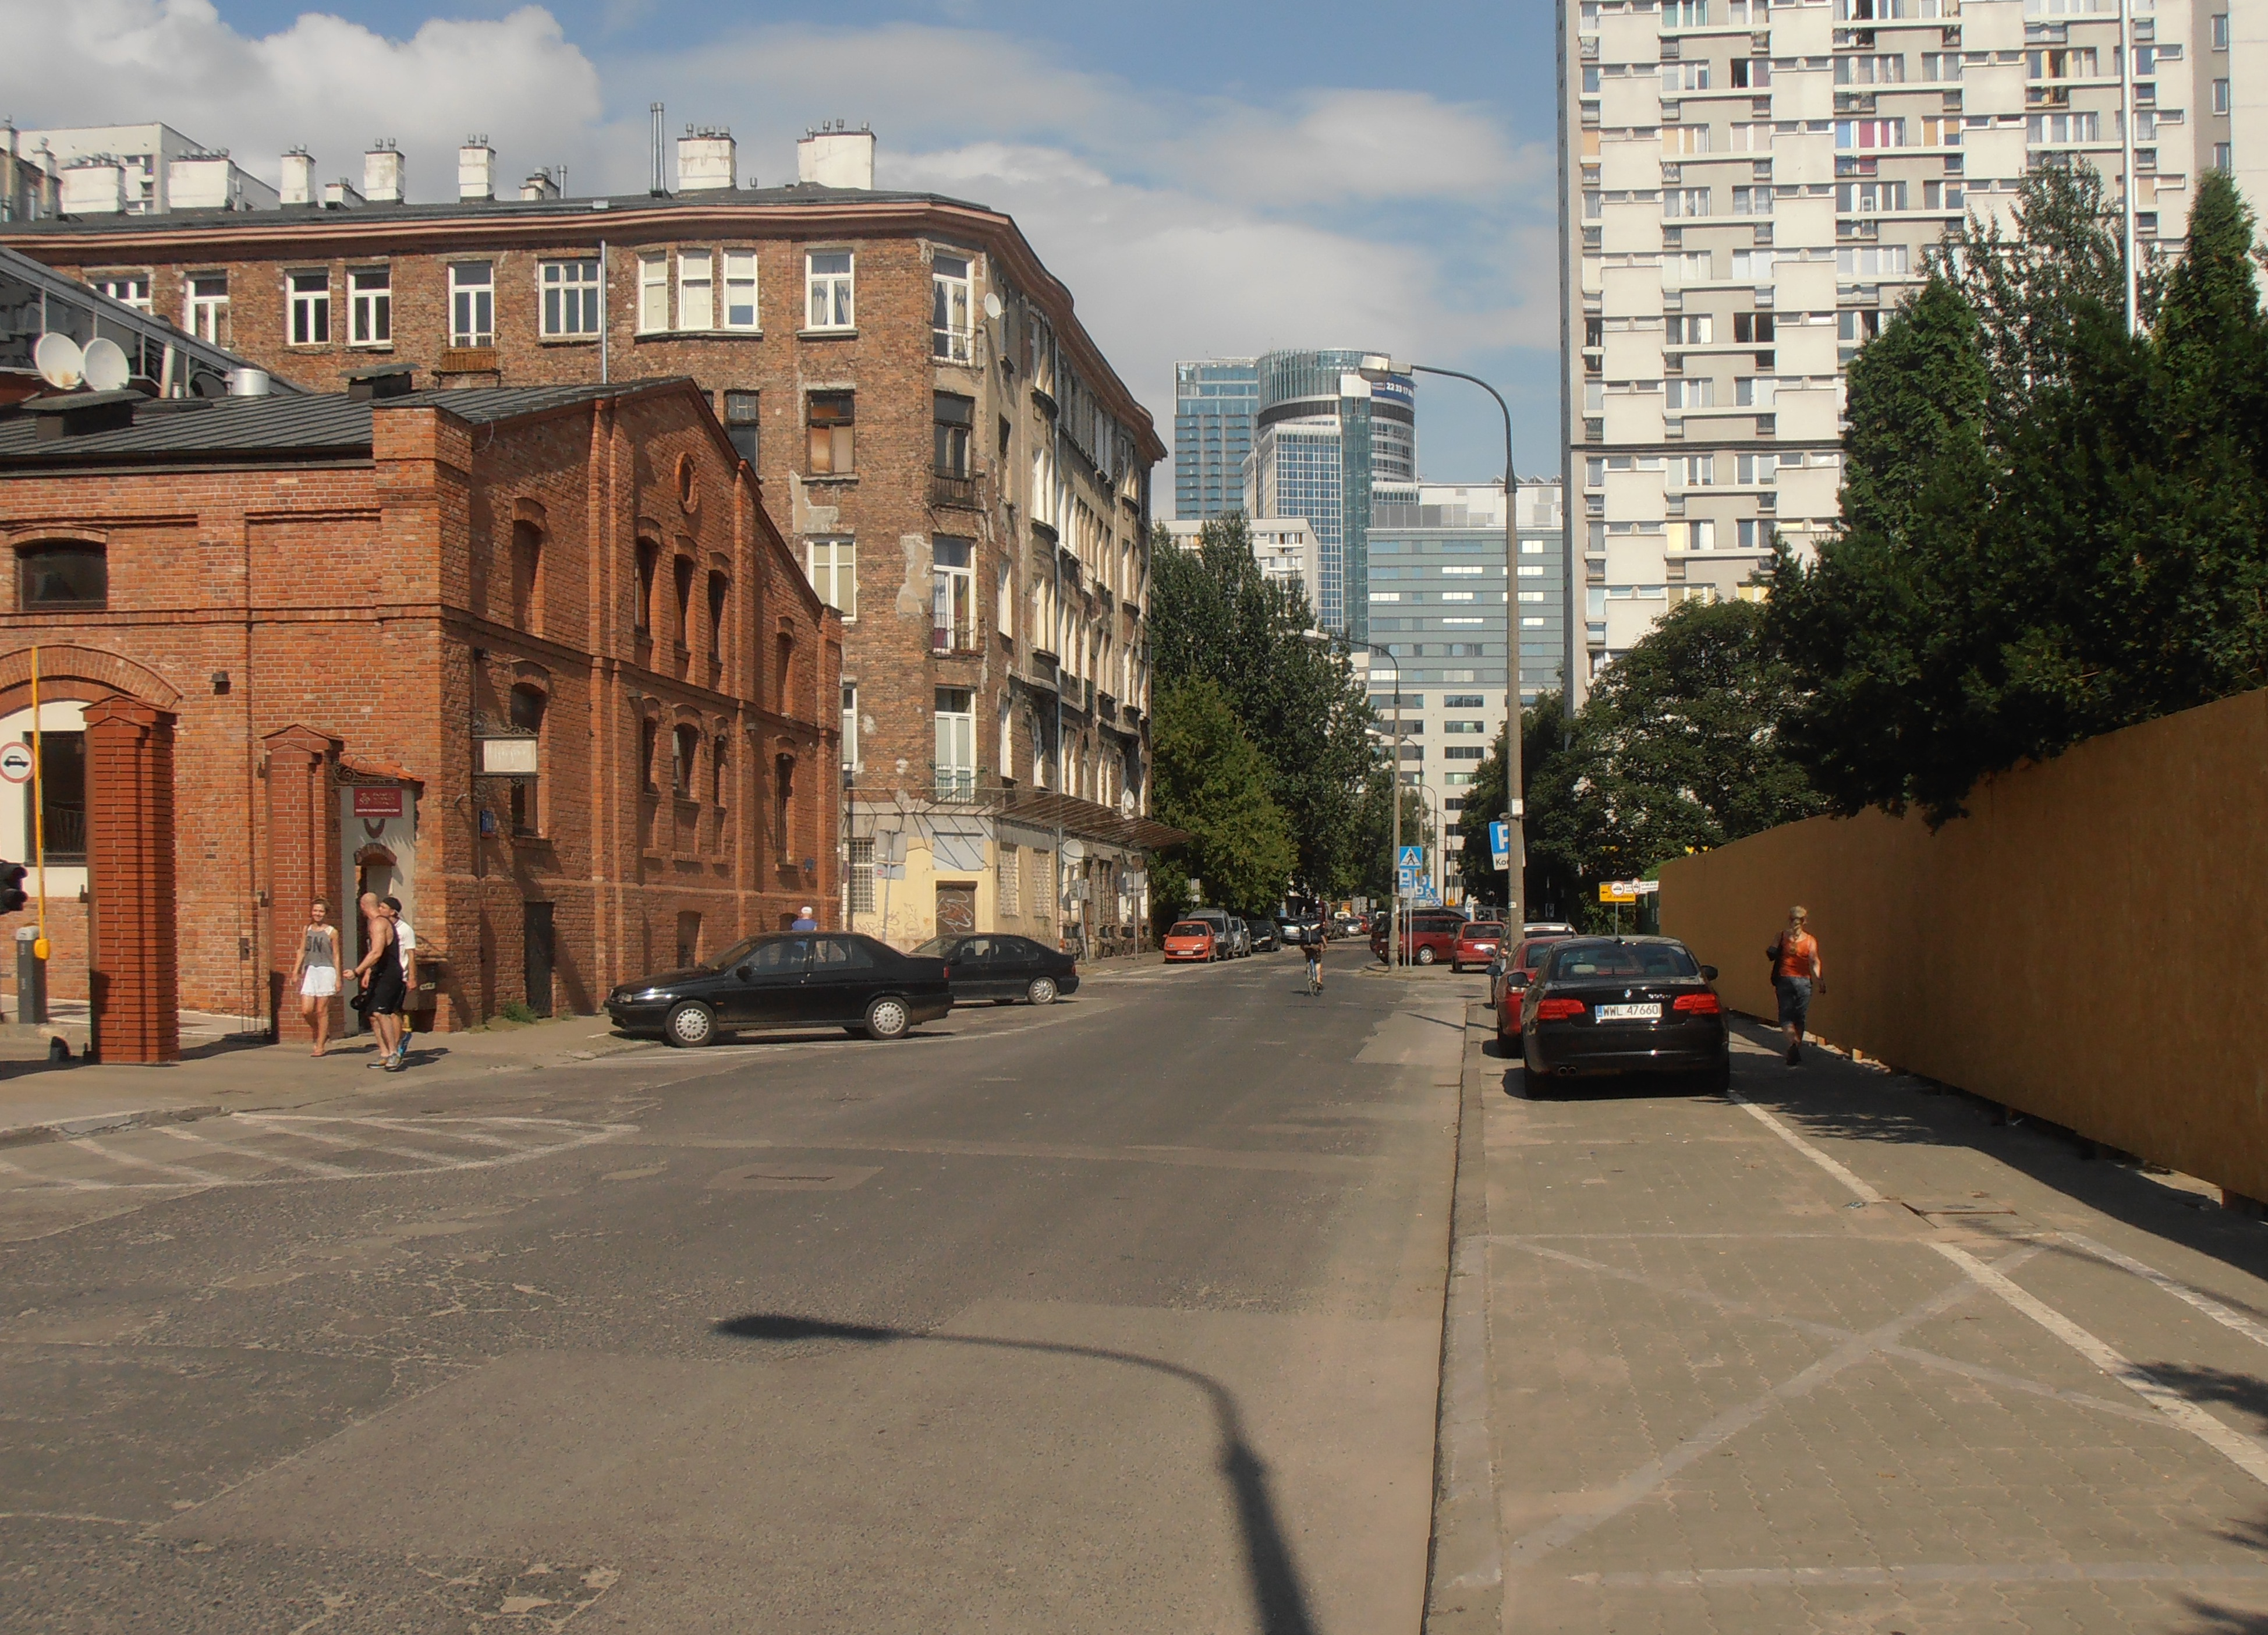 Ulica Pereca